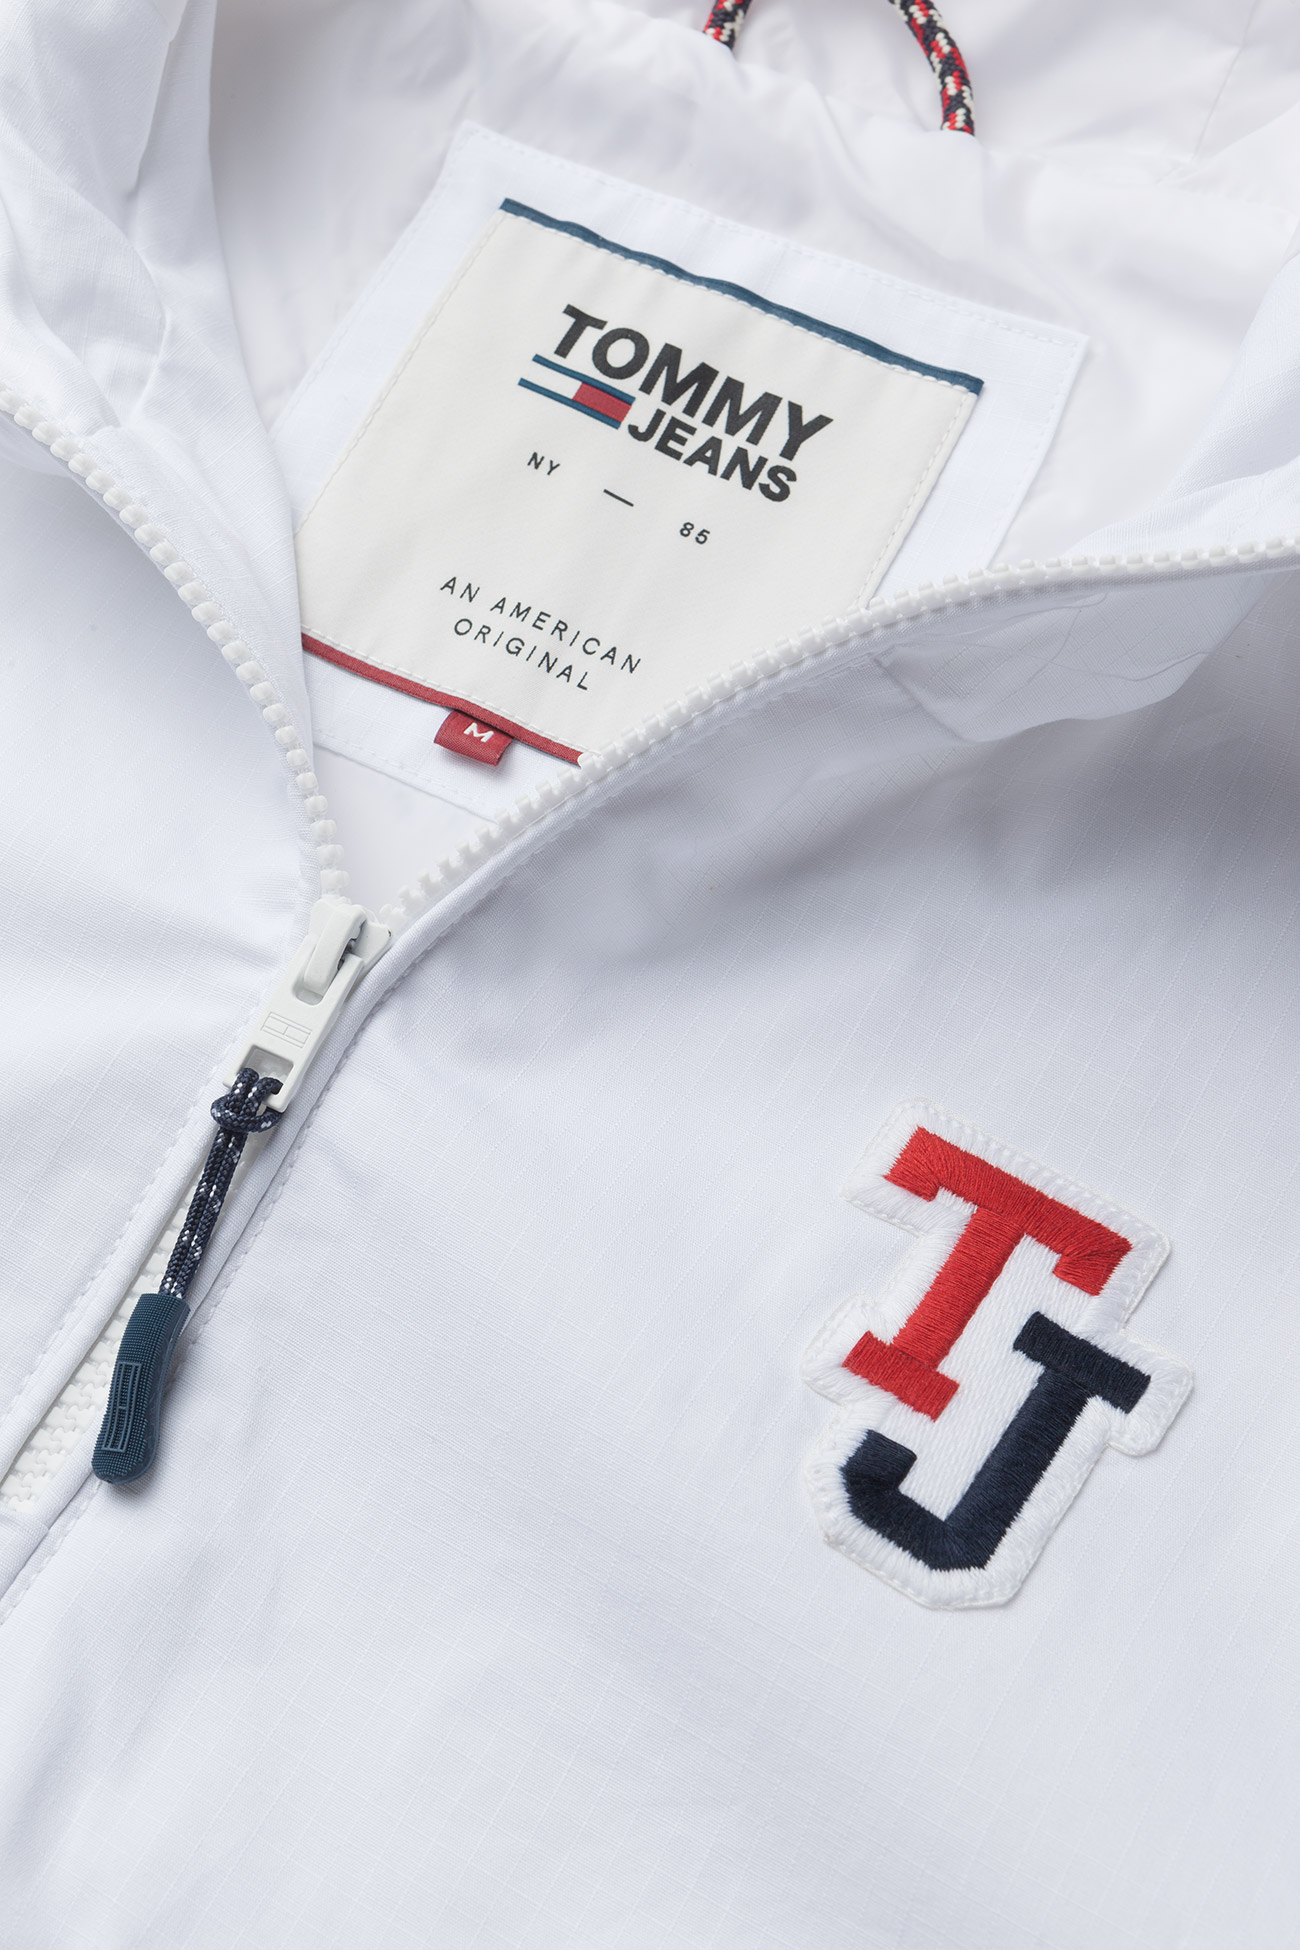 Pullover Logo Jaclassic Jeans Tjm WhiteTommy 34AqR5jL